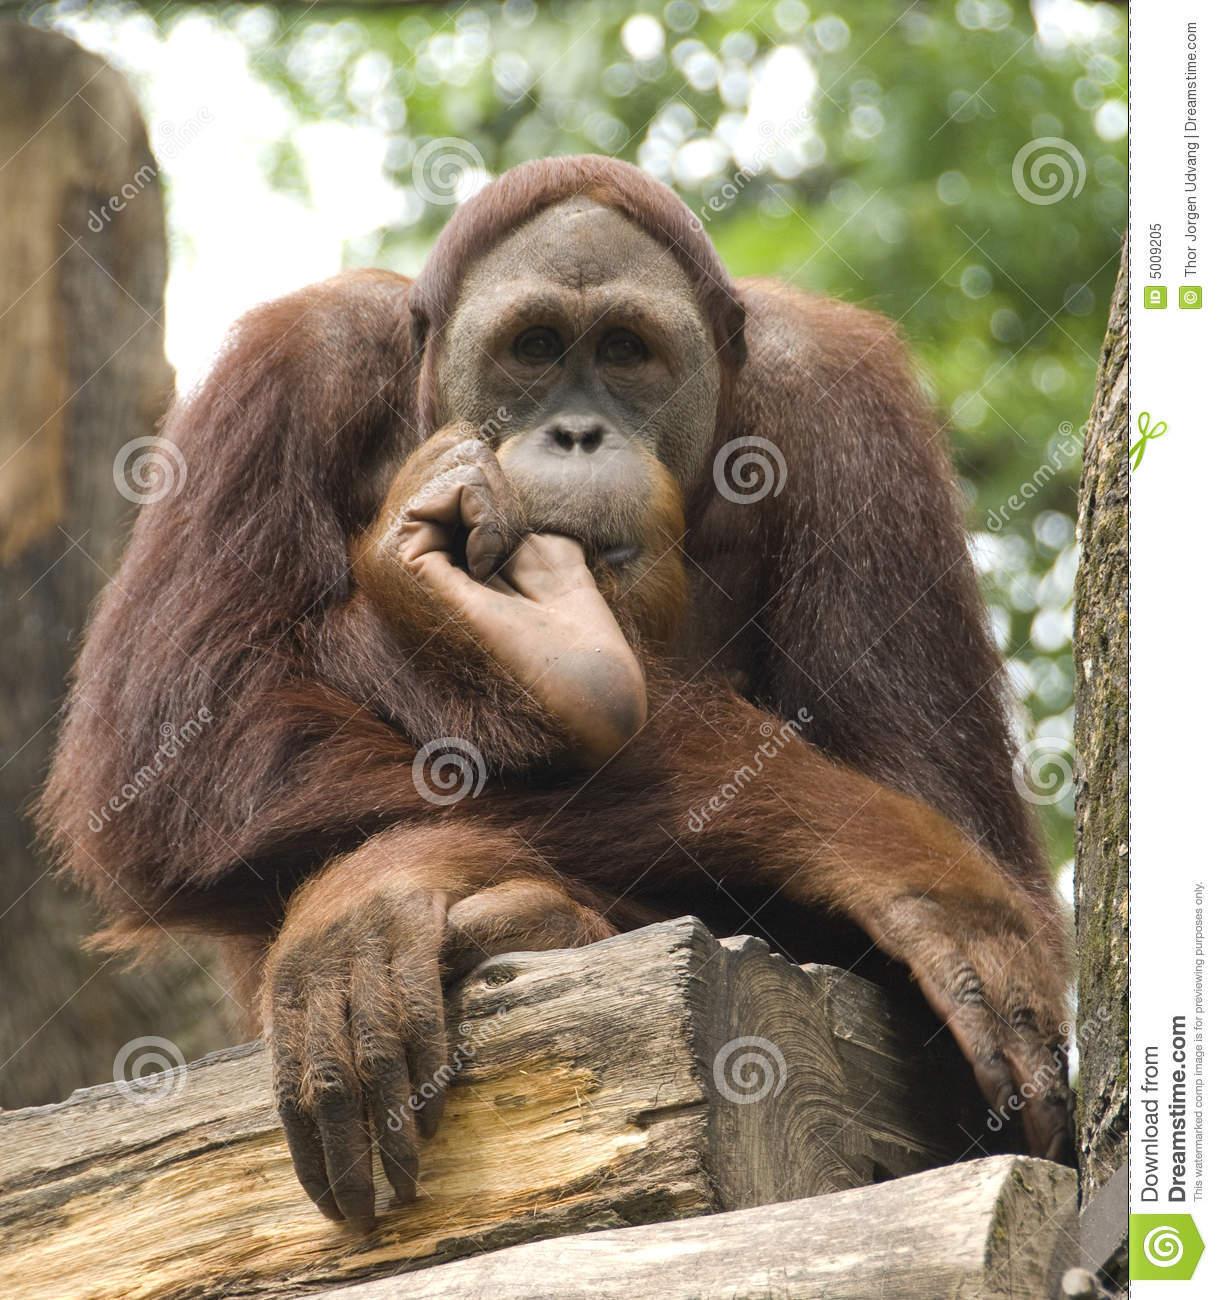 Отсосала обезьяне